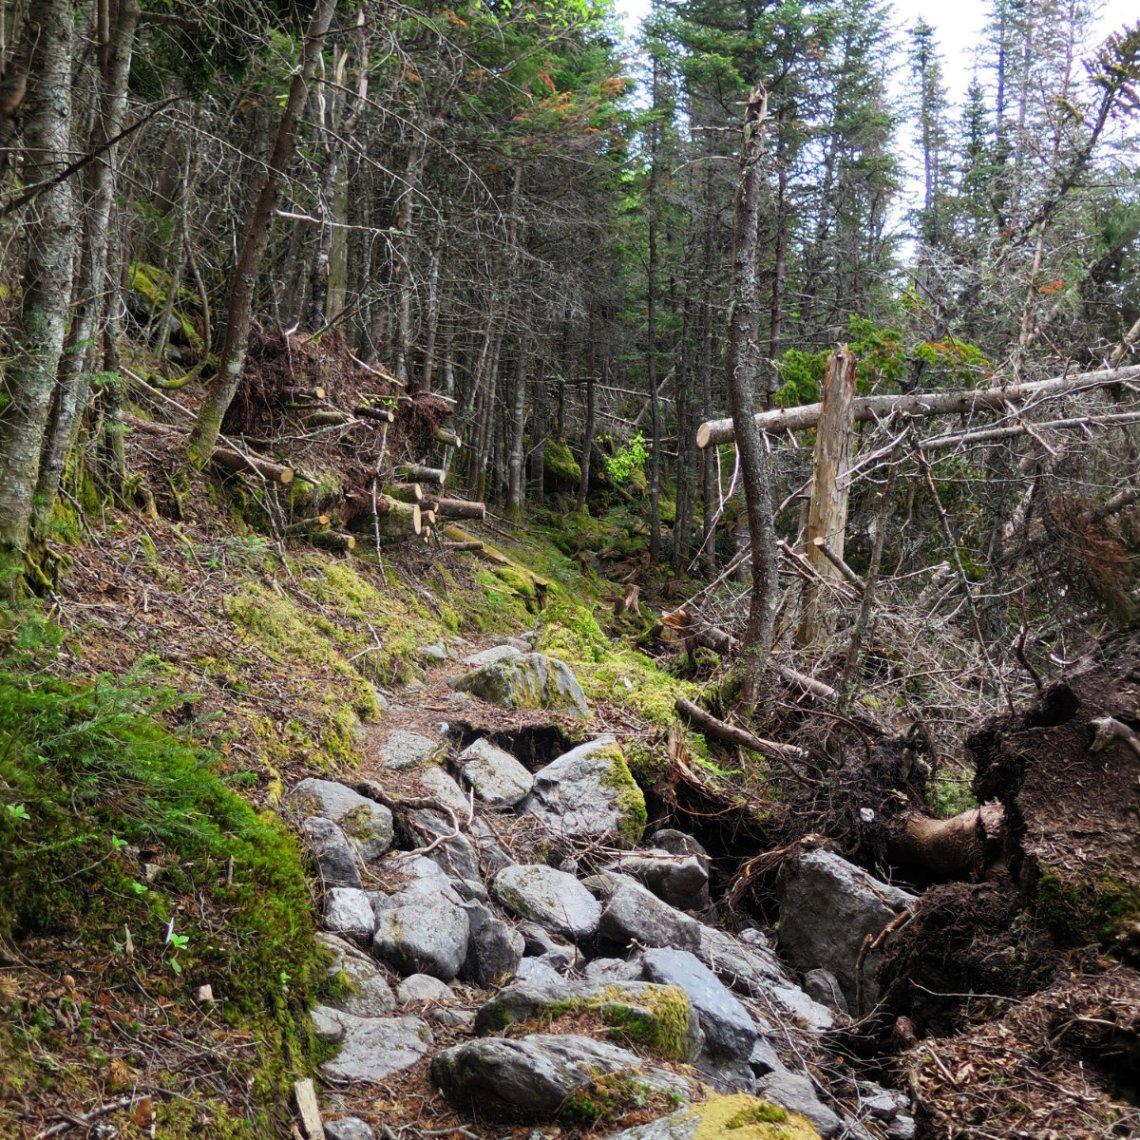 20180616-Trail-Work